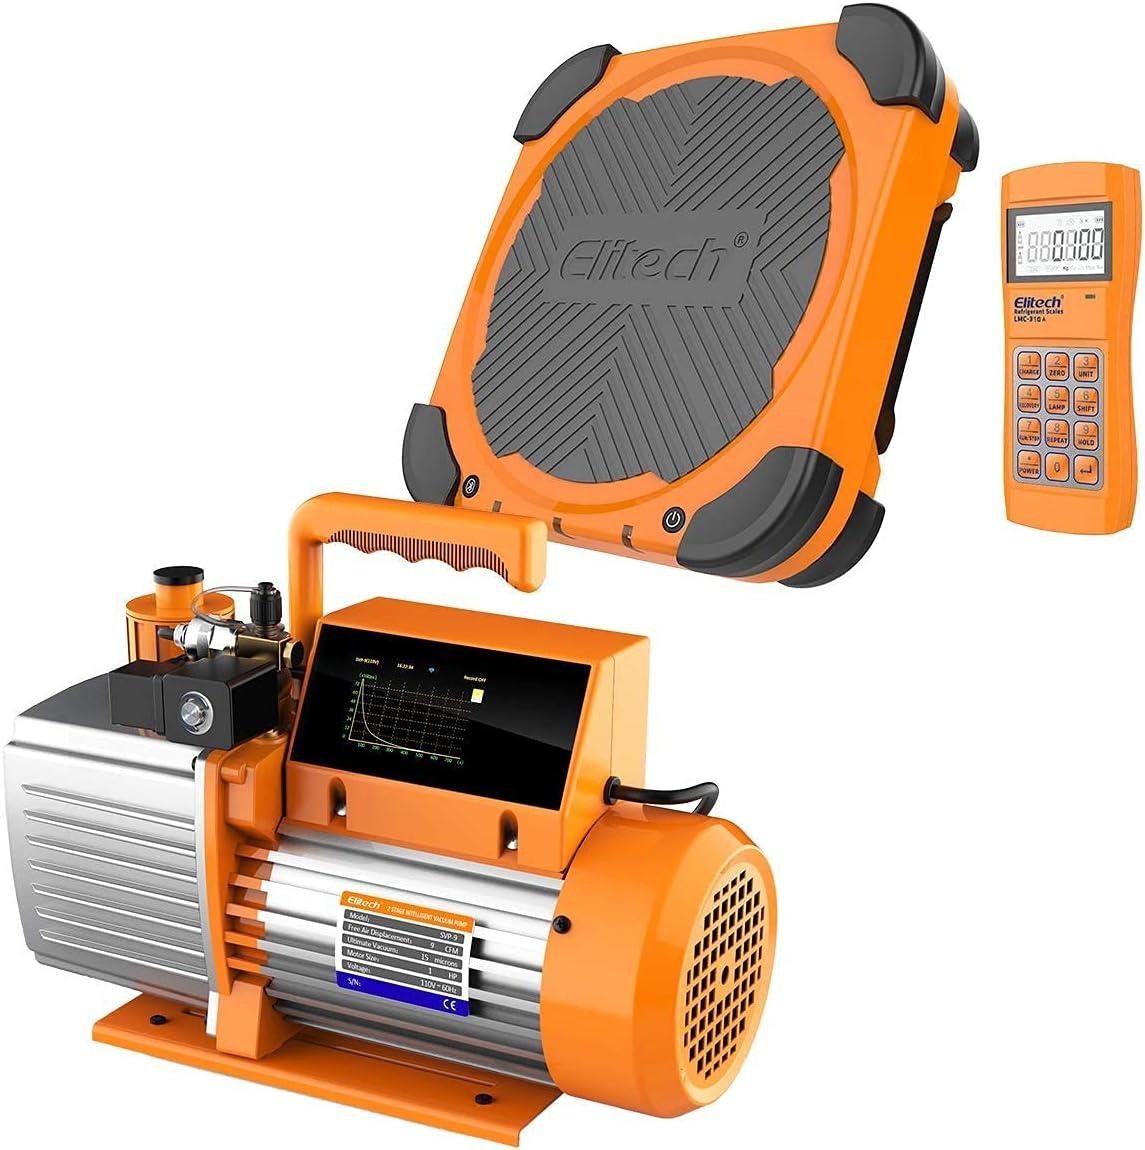 Elitech SVP-9 Vacuum Pump 9 CFM Limited price sale Stage Intelligent 2 HVAC 40% OFF Cheap Sale LMC-310